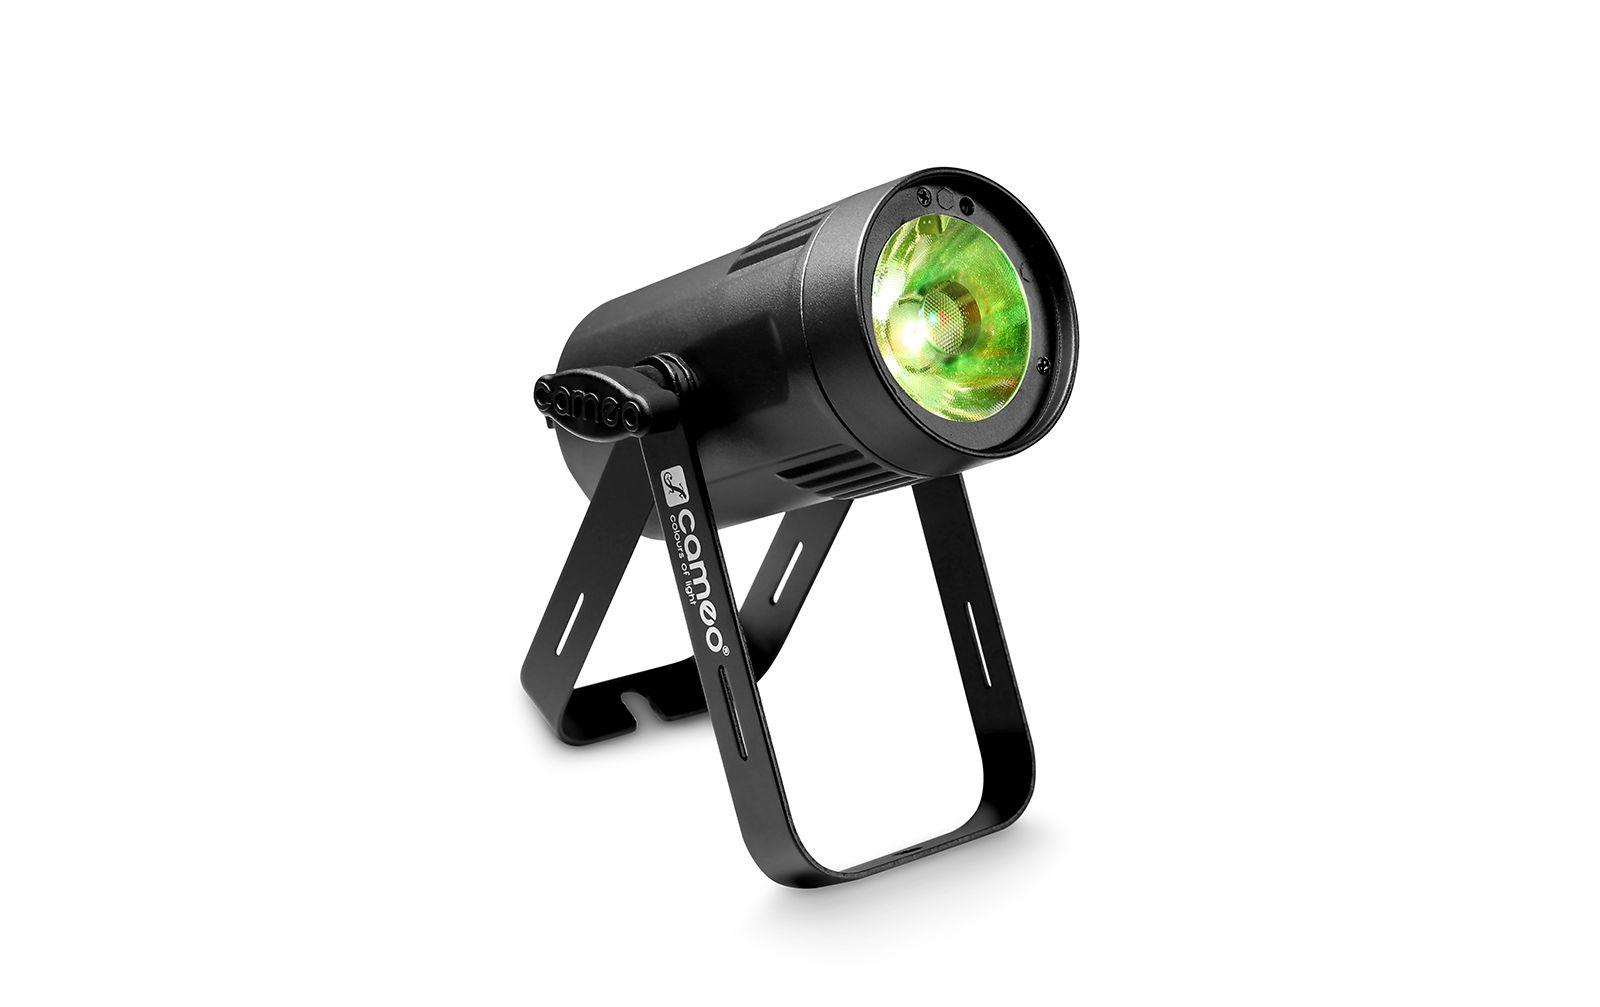 cameo-q-spot-15-rgbw-kompakter-spot-mit-15w-rgbw-led-in-schwarzer-ausfa-hrung